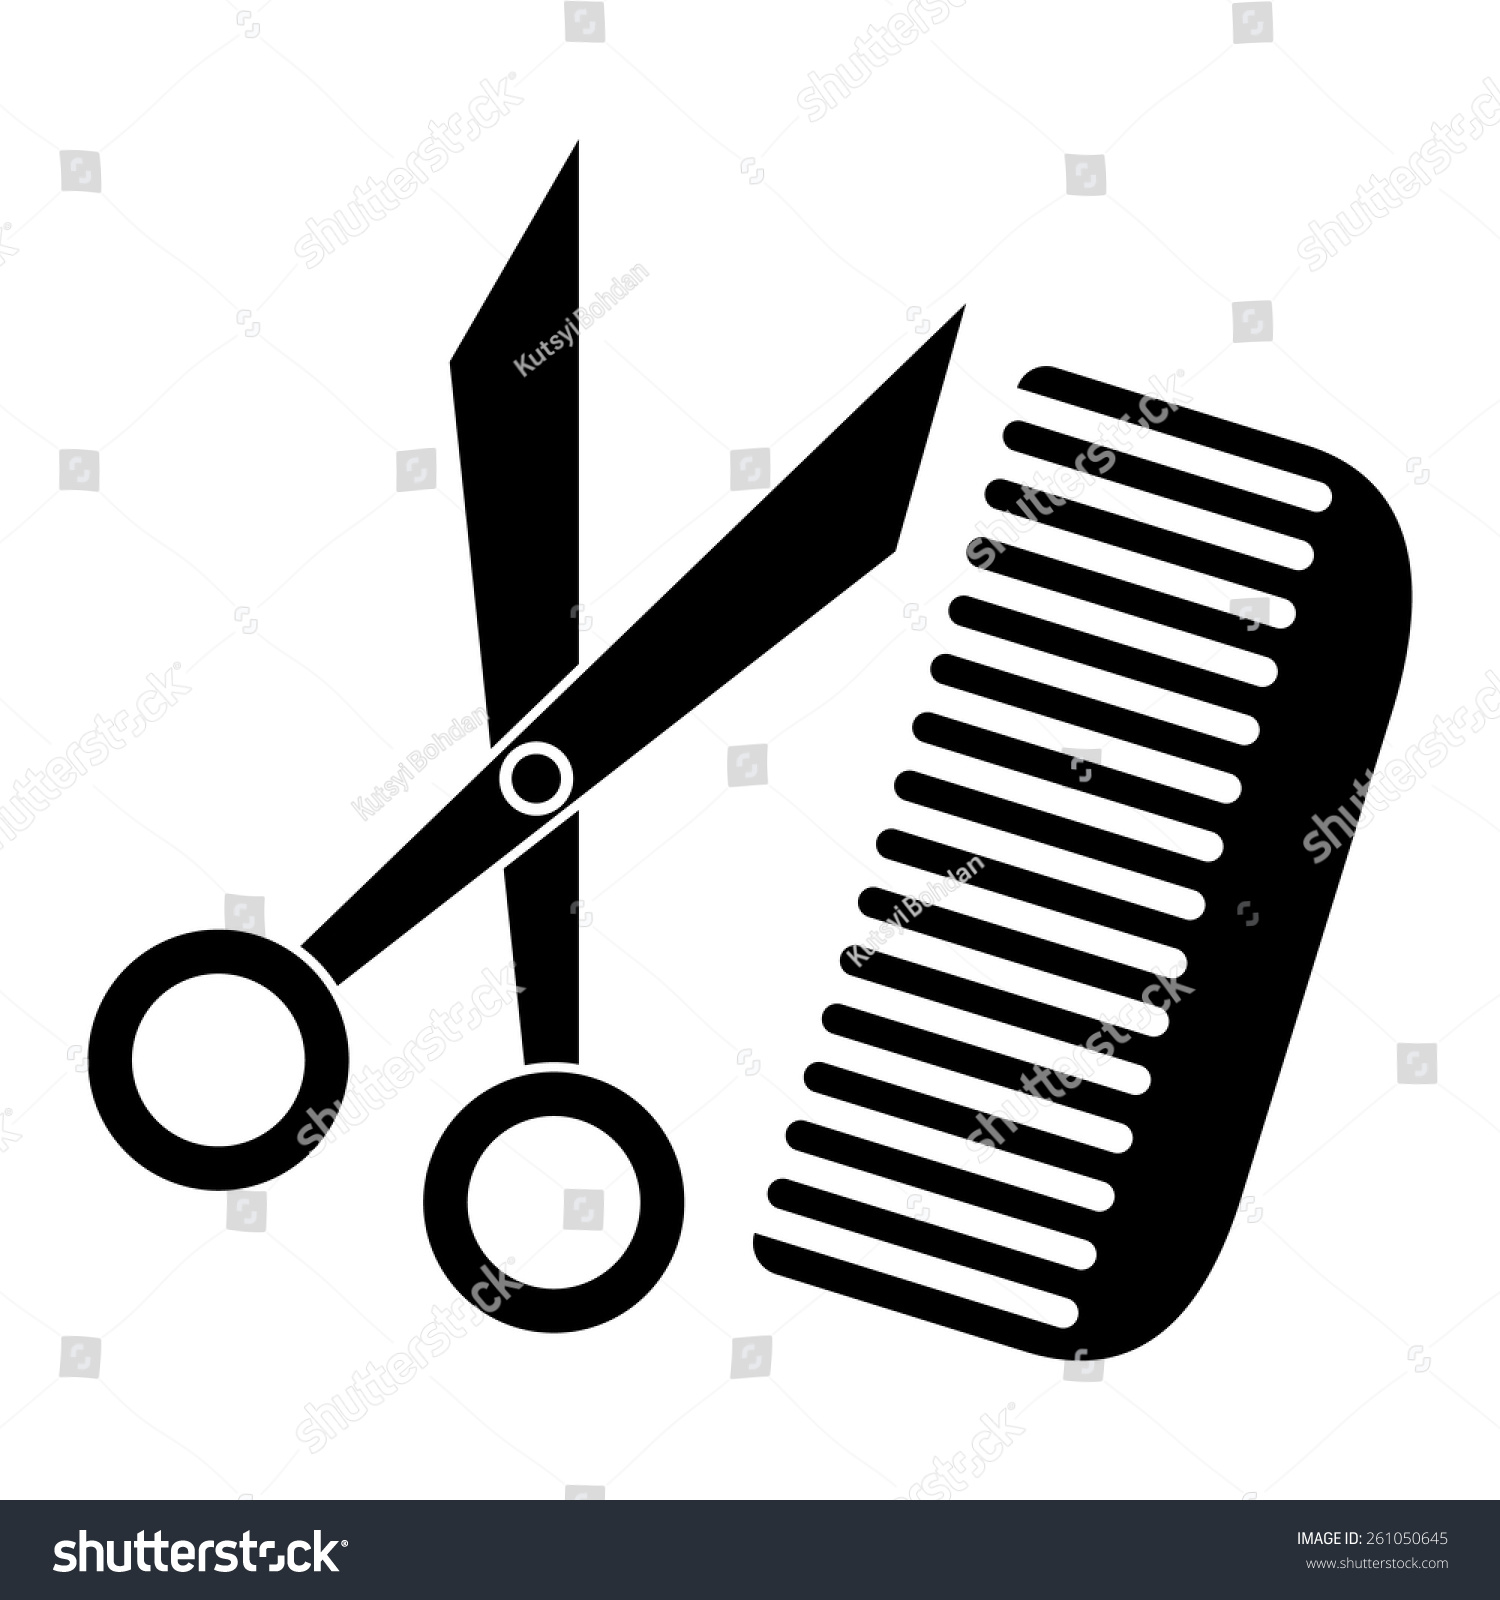 Vector Scissors And Comb - 261050645 : Shutterstock Comb Sketch